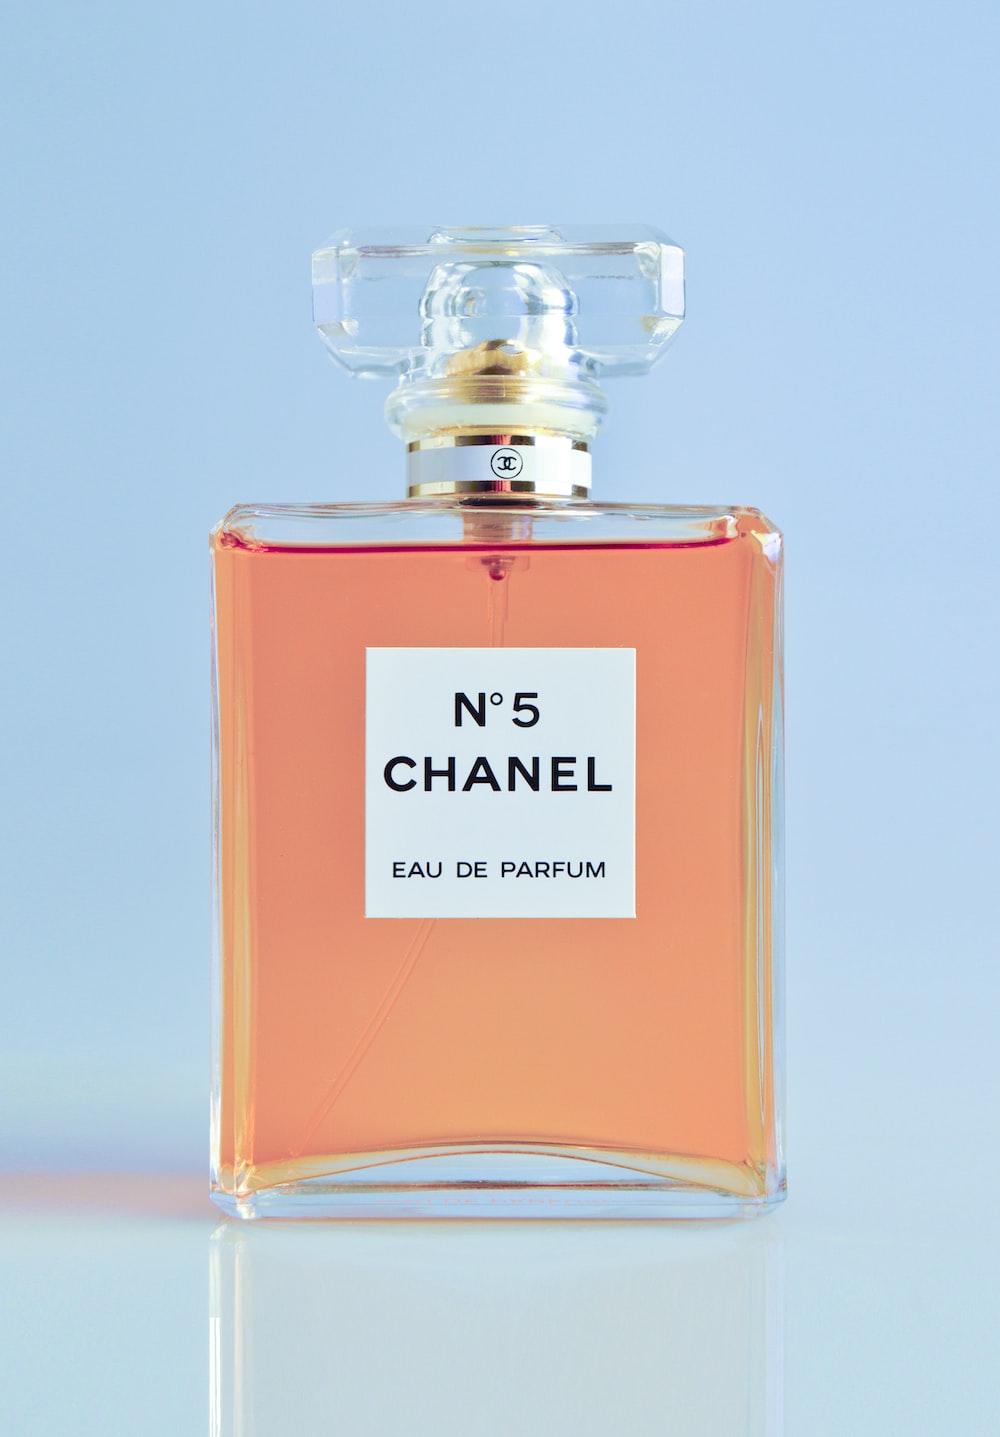 N5 Chanel eau de parfum spray bottle